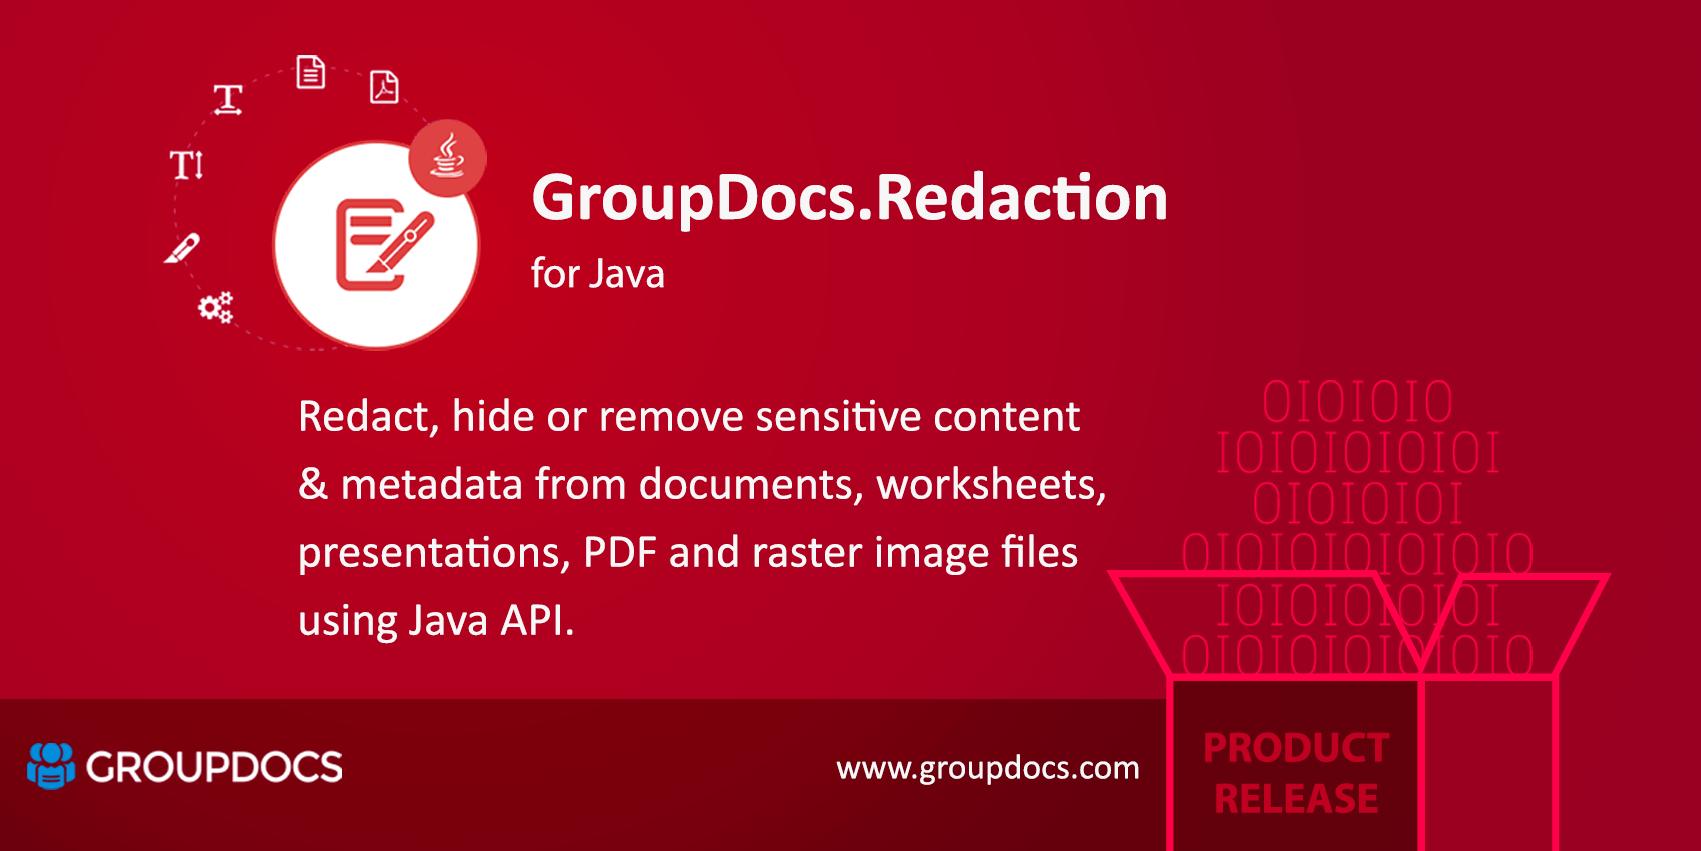 Big News Groupdocsdaction Has Been Released For Java Platform Groupdocs